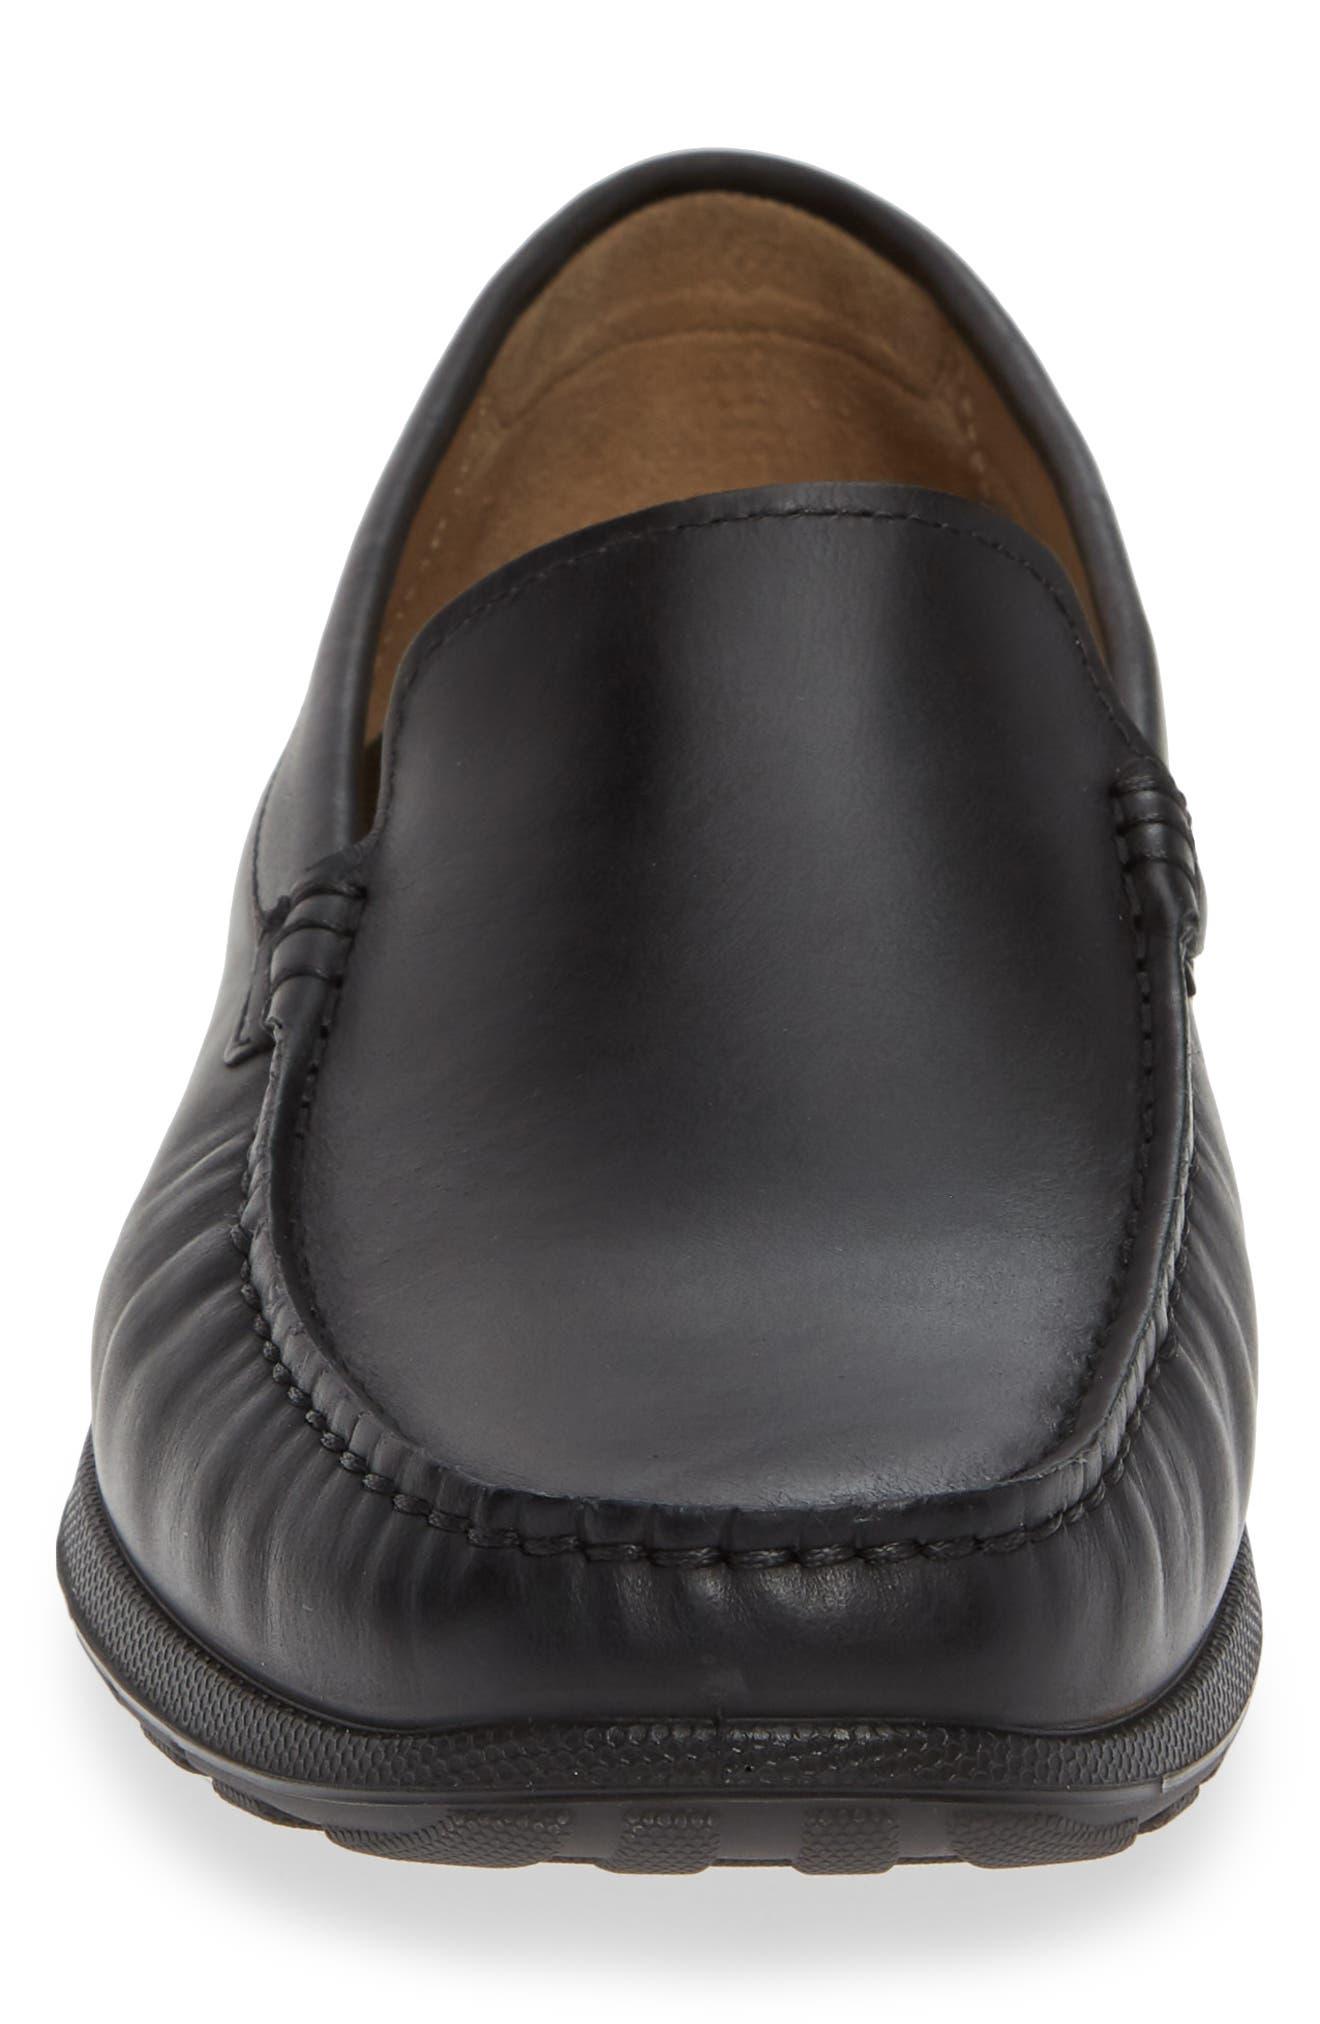 Dip Moc Toe Driving Loafer,                             Alternate thumbnail 4, color,                             BLACK LEATHER